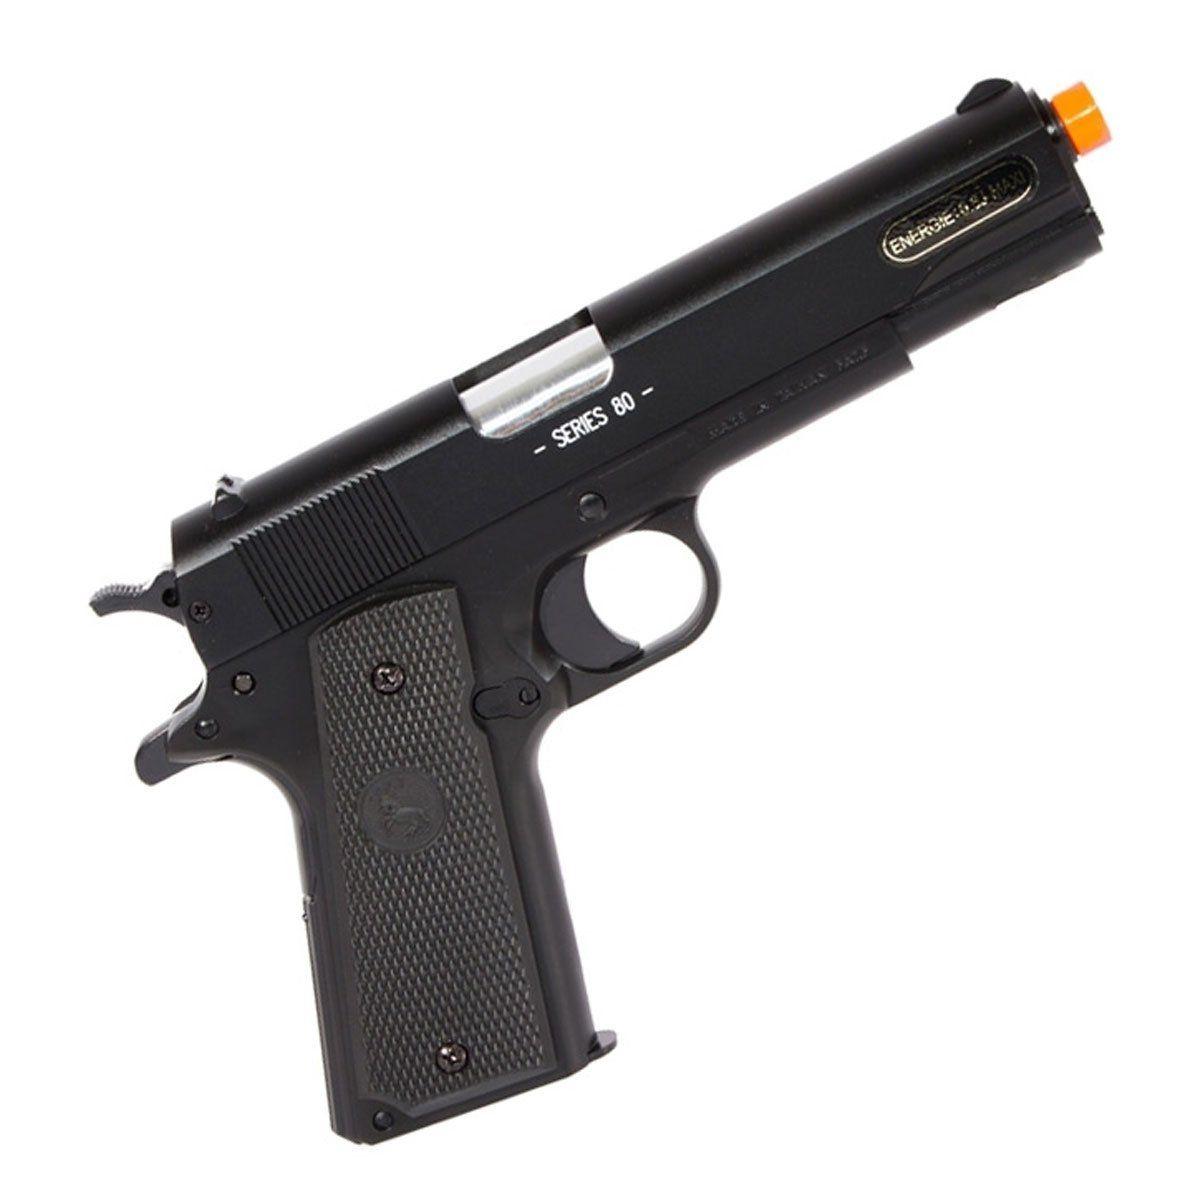 Pistola de airsoft Colt 1911- Slide metal cal 6mm